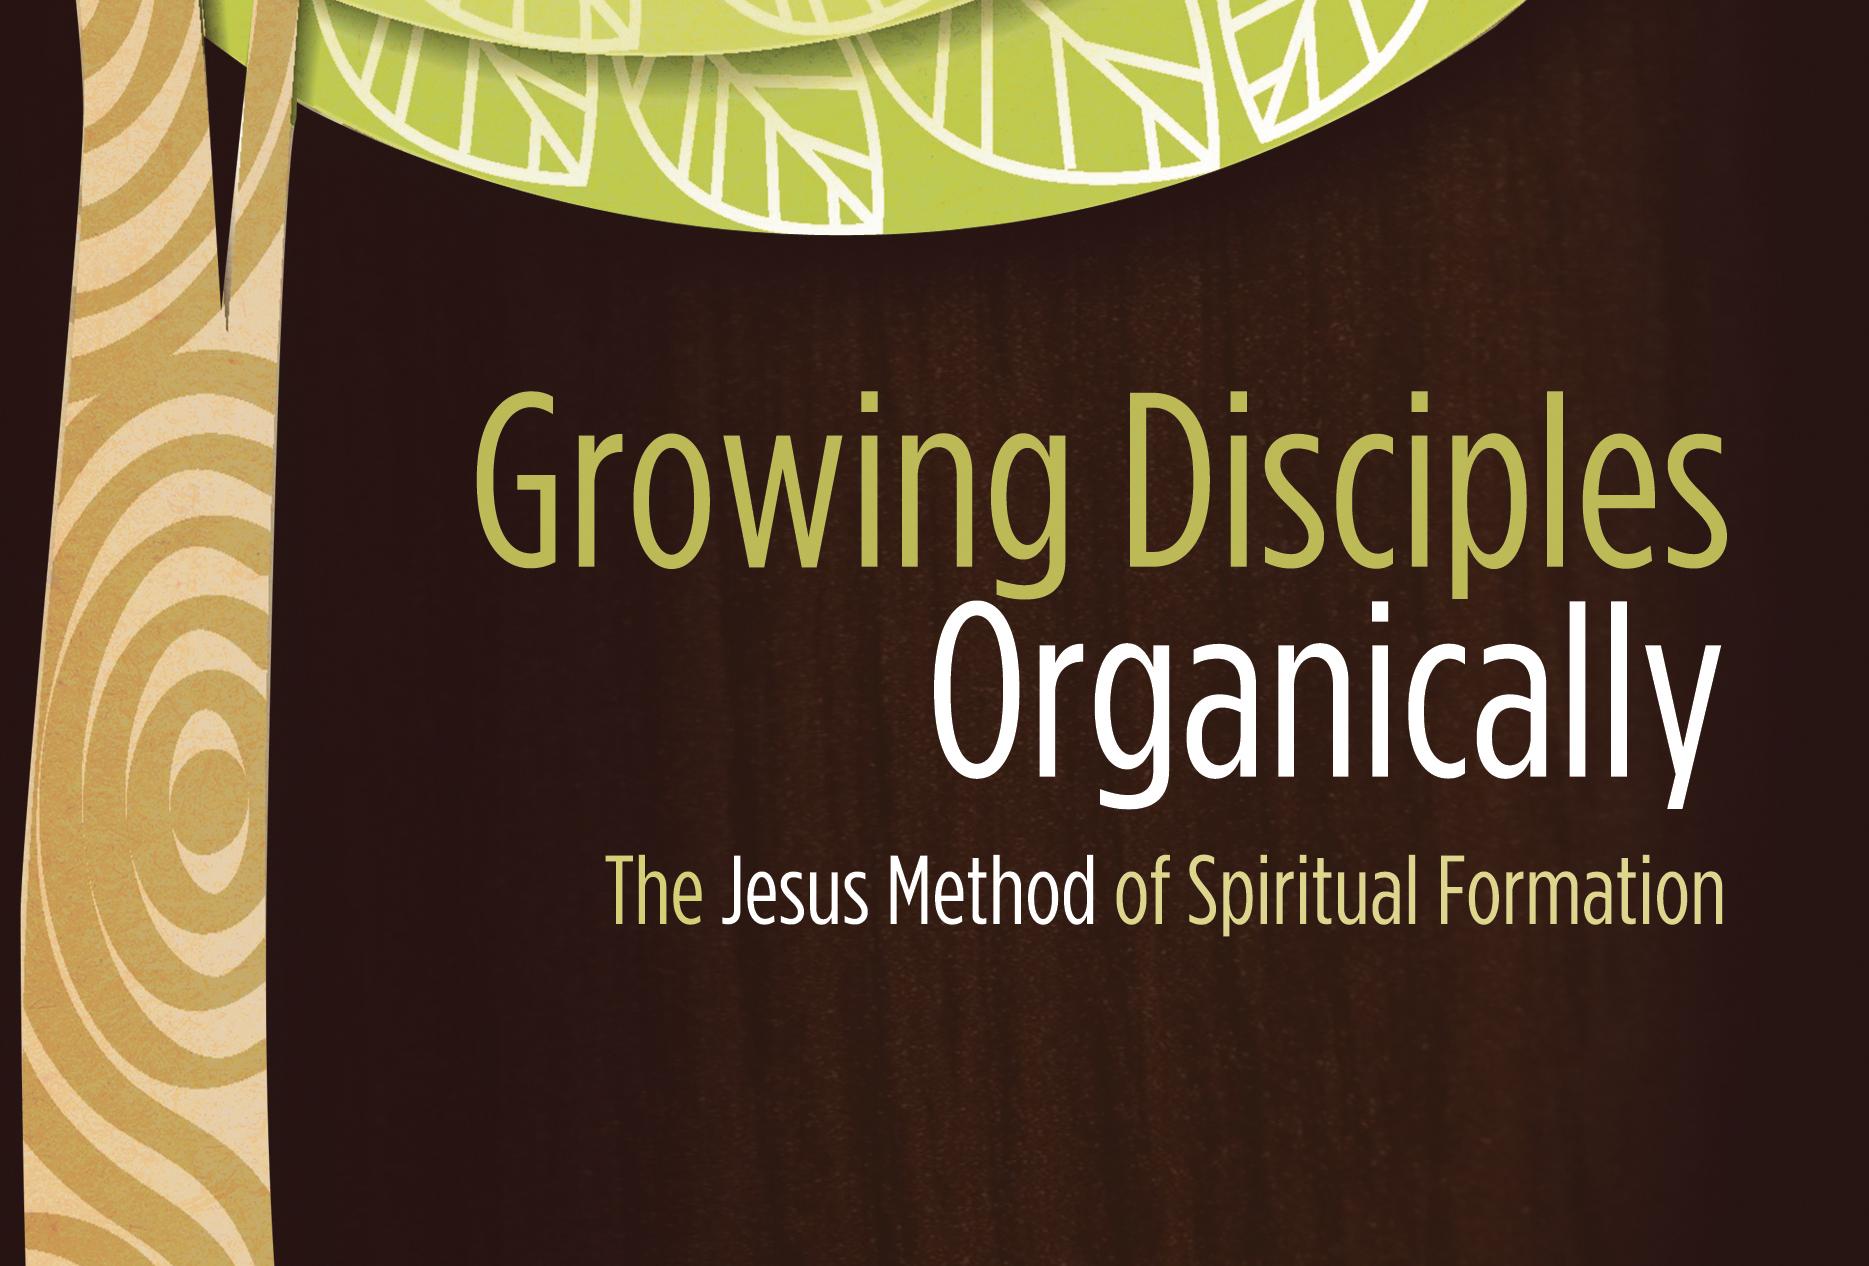 Growing-Disciples-Organically-FI.jpg